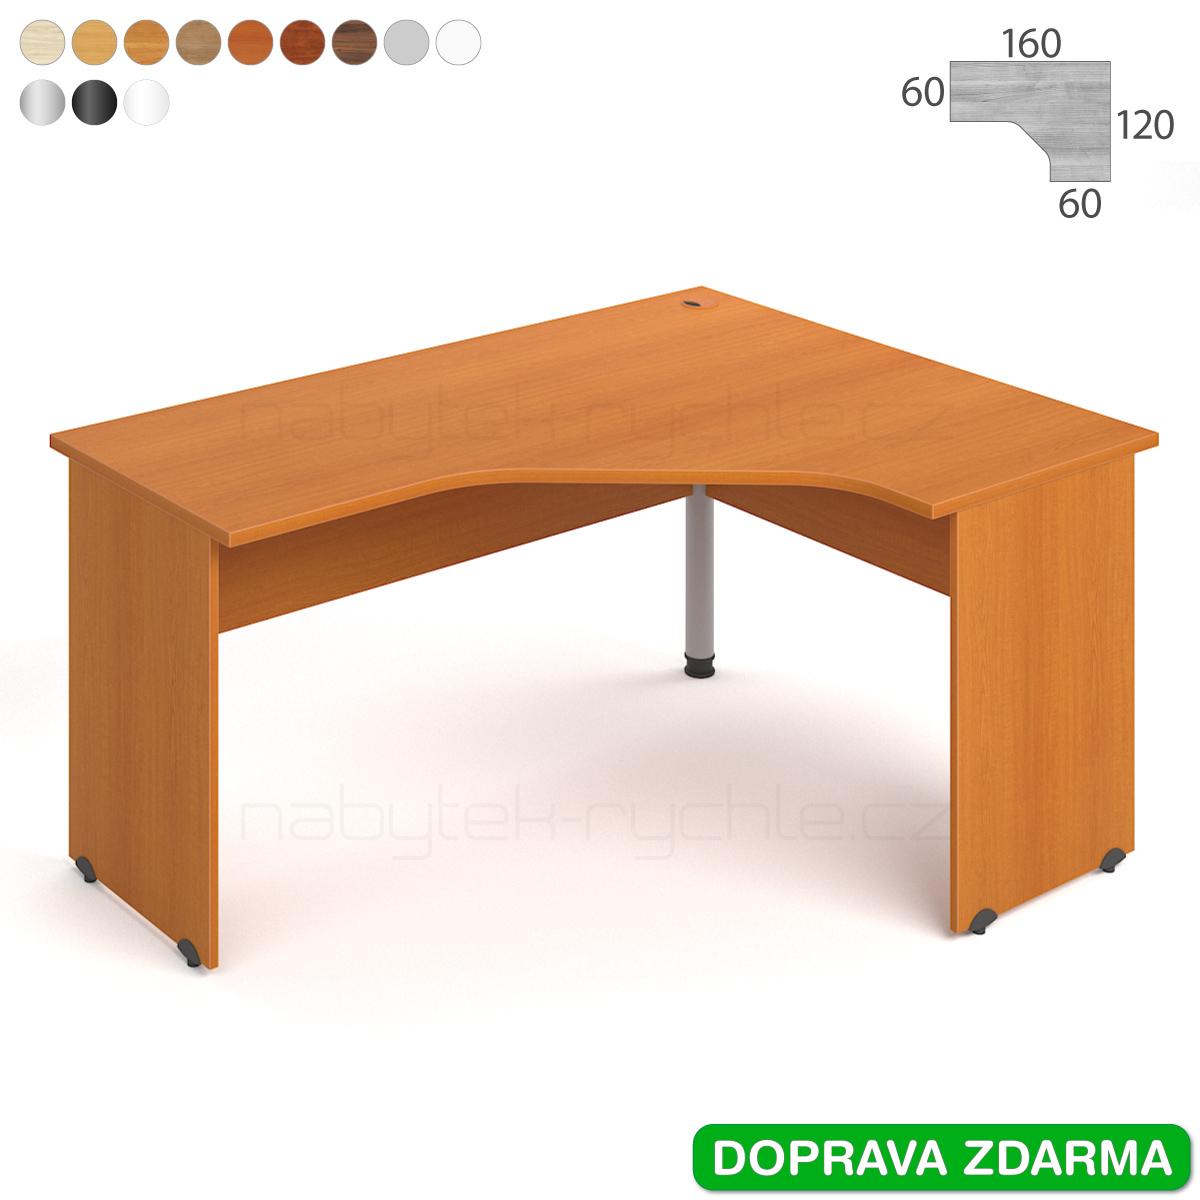 GEV 60 L Hobis Gate - Stůl 160 x 120